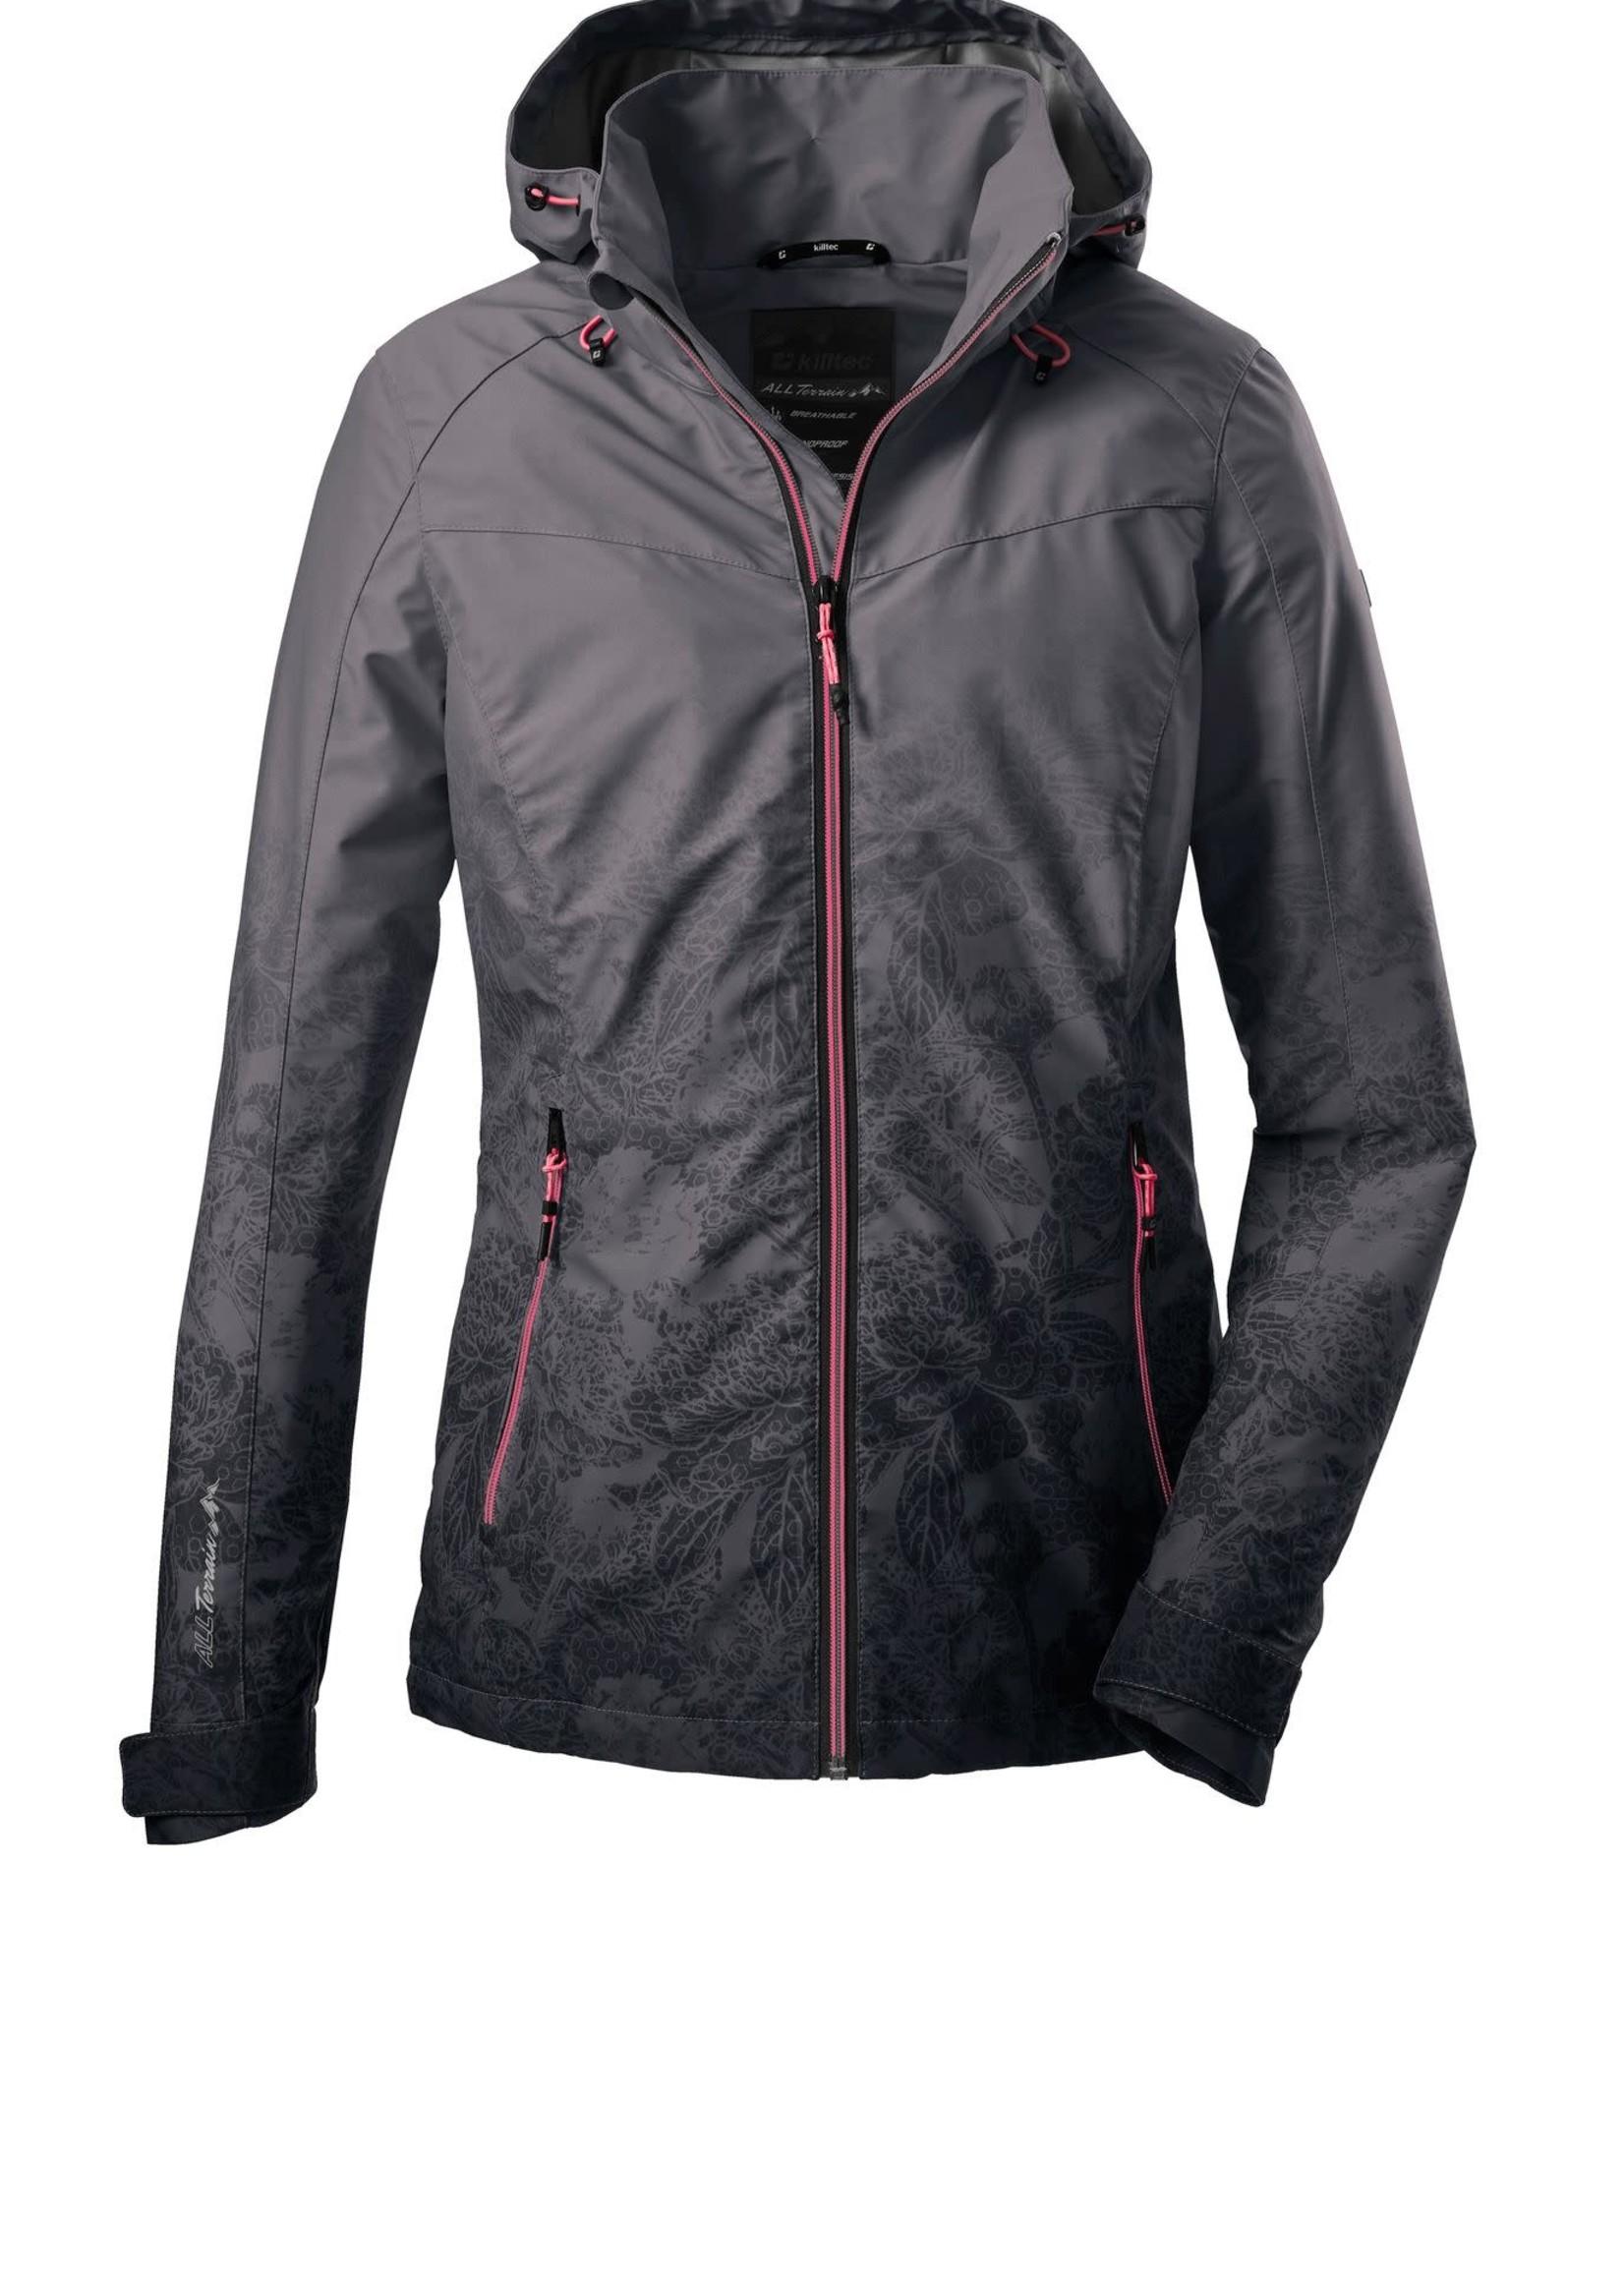 Killtec Killtec Vojak Softshell Jacket with Zip-off Hood 36596